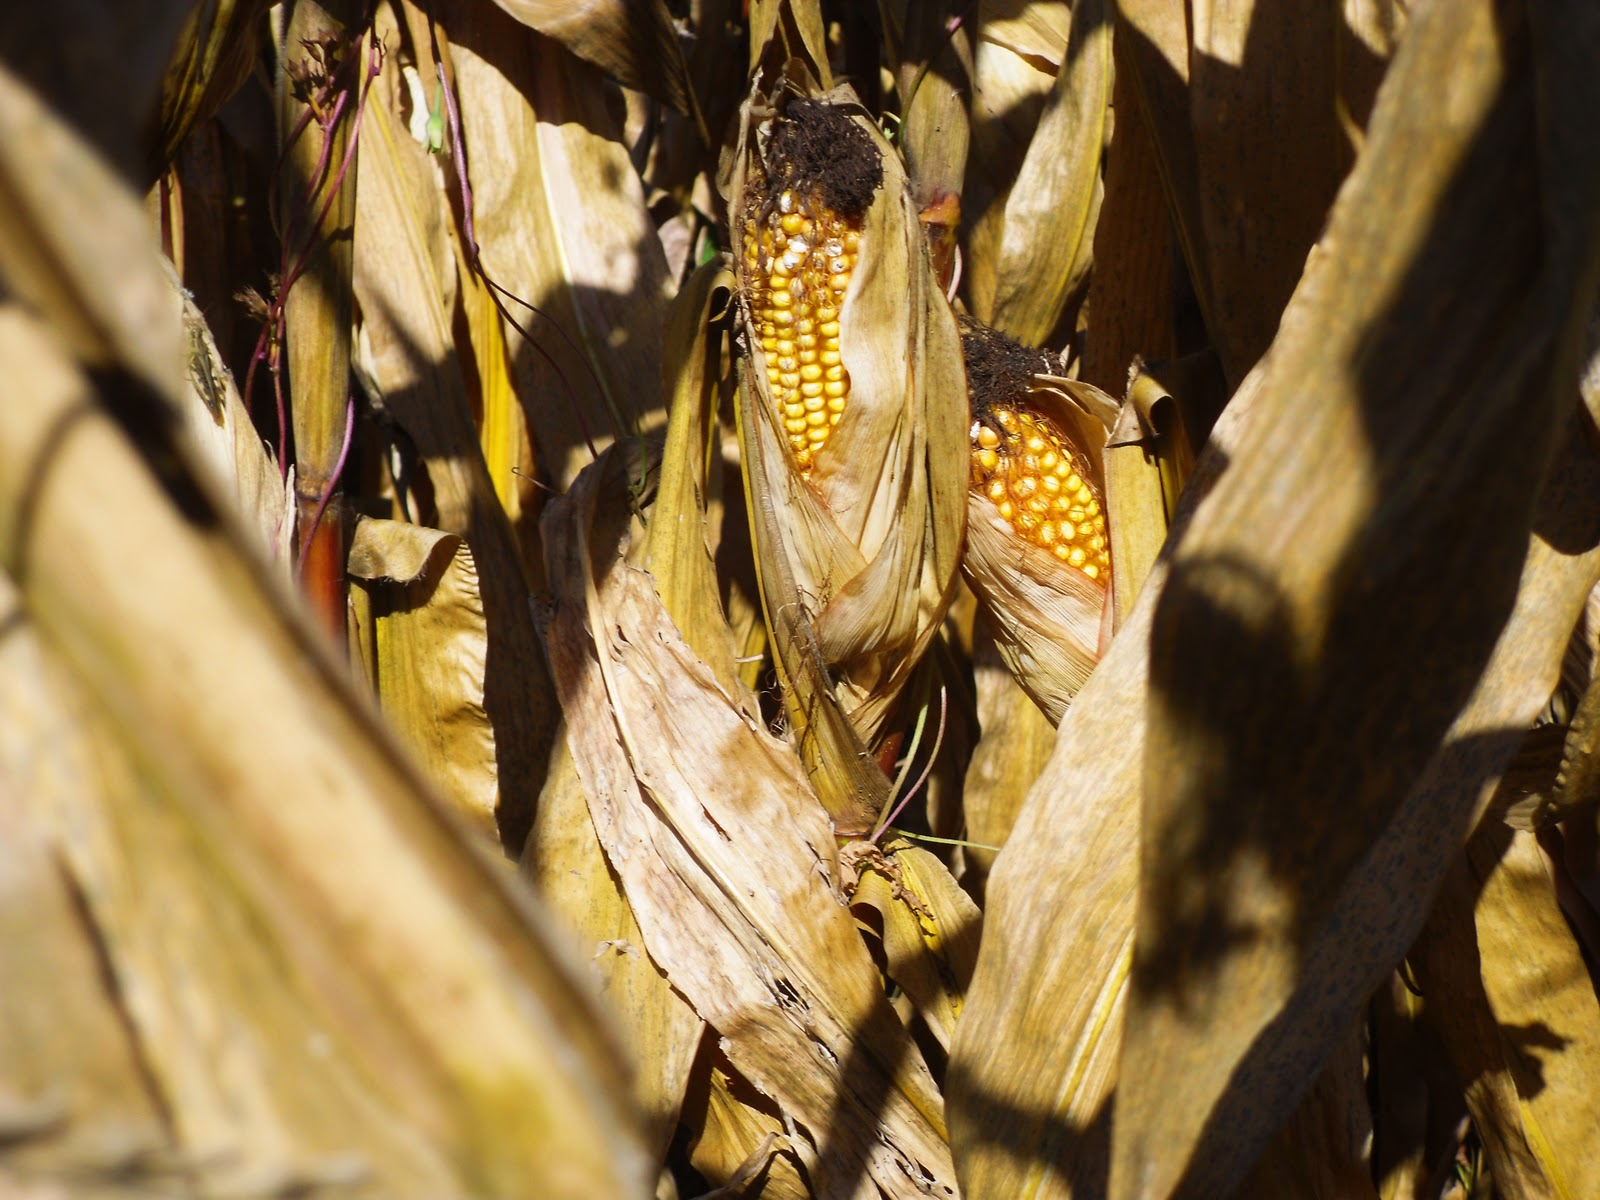 Culpeper Virginia Golden Ears Of Corn